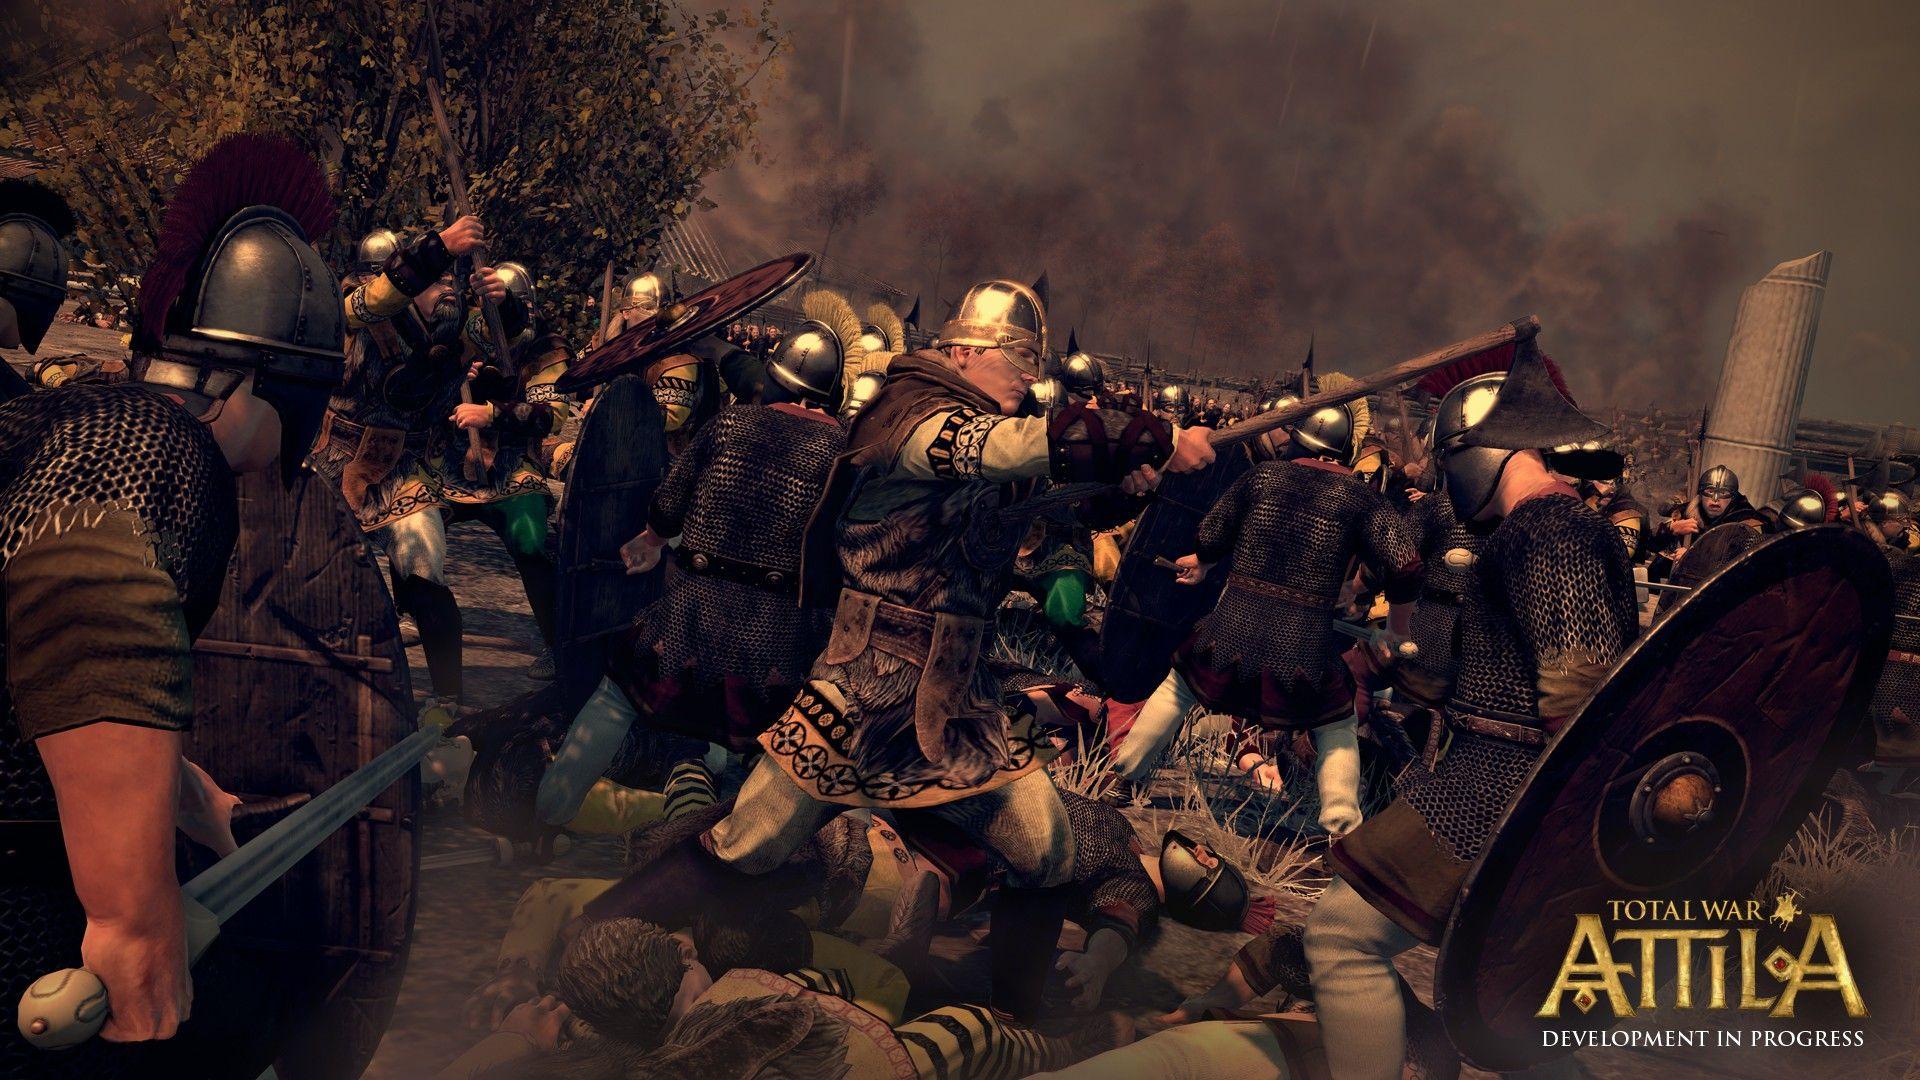 Total War Attila Wallpaper http//www.cartoonography